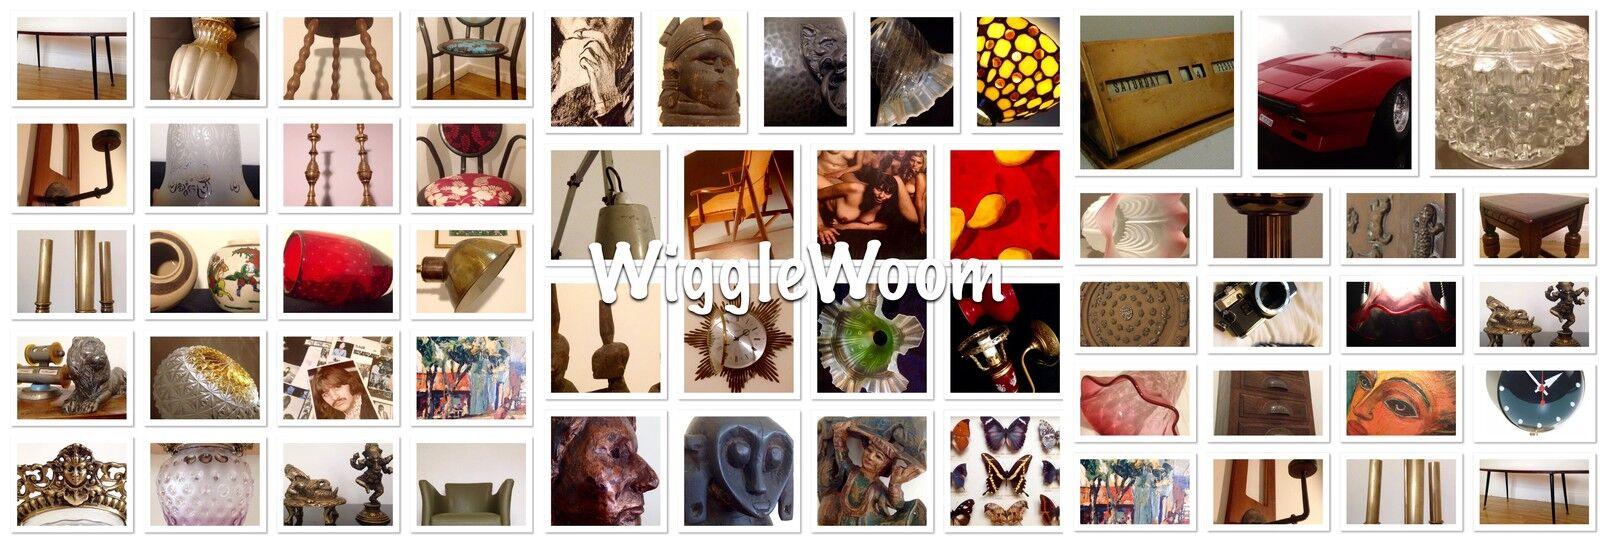 WiggleWoom